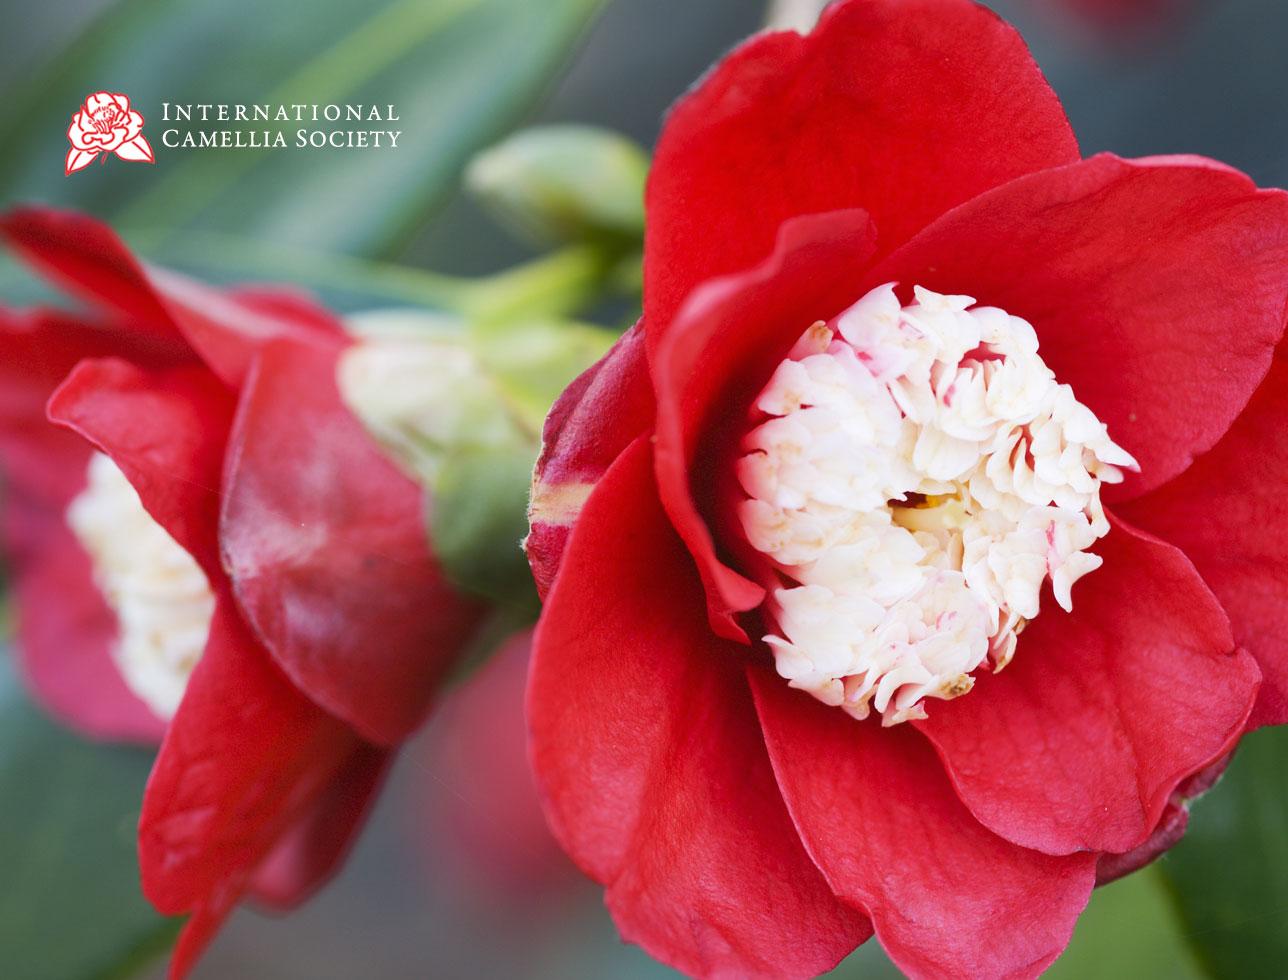 International Camellia Society website design